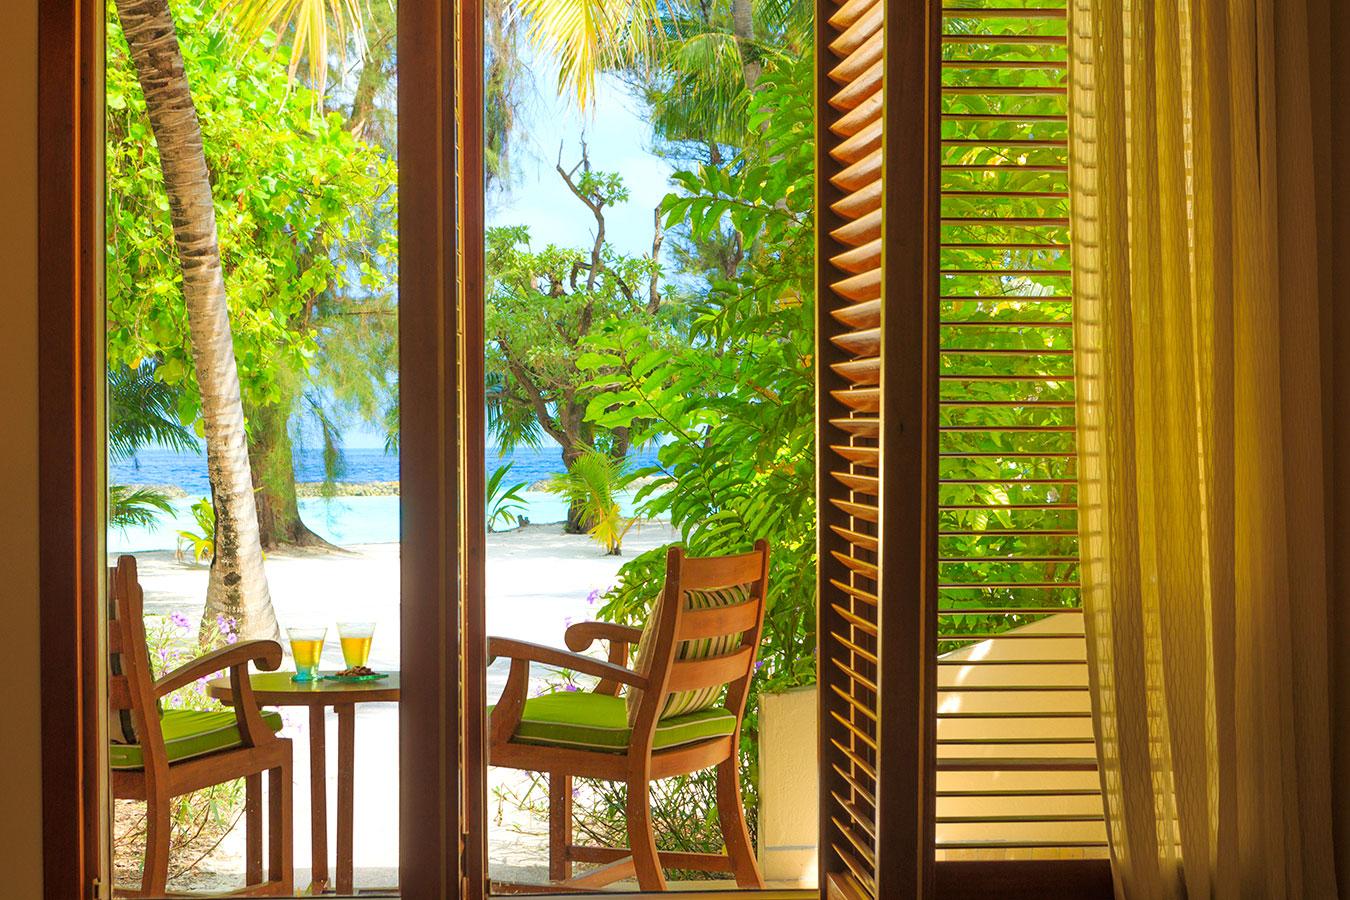 Kurumba Maldives - Deluxe Room Balcony image  - Maldives Resort